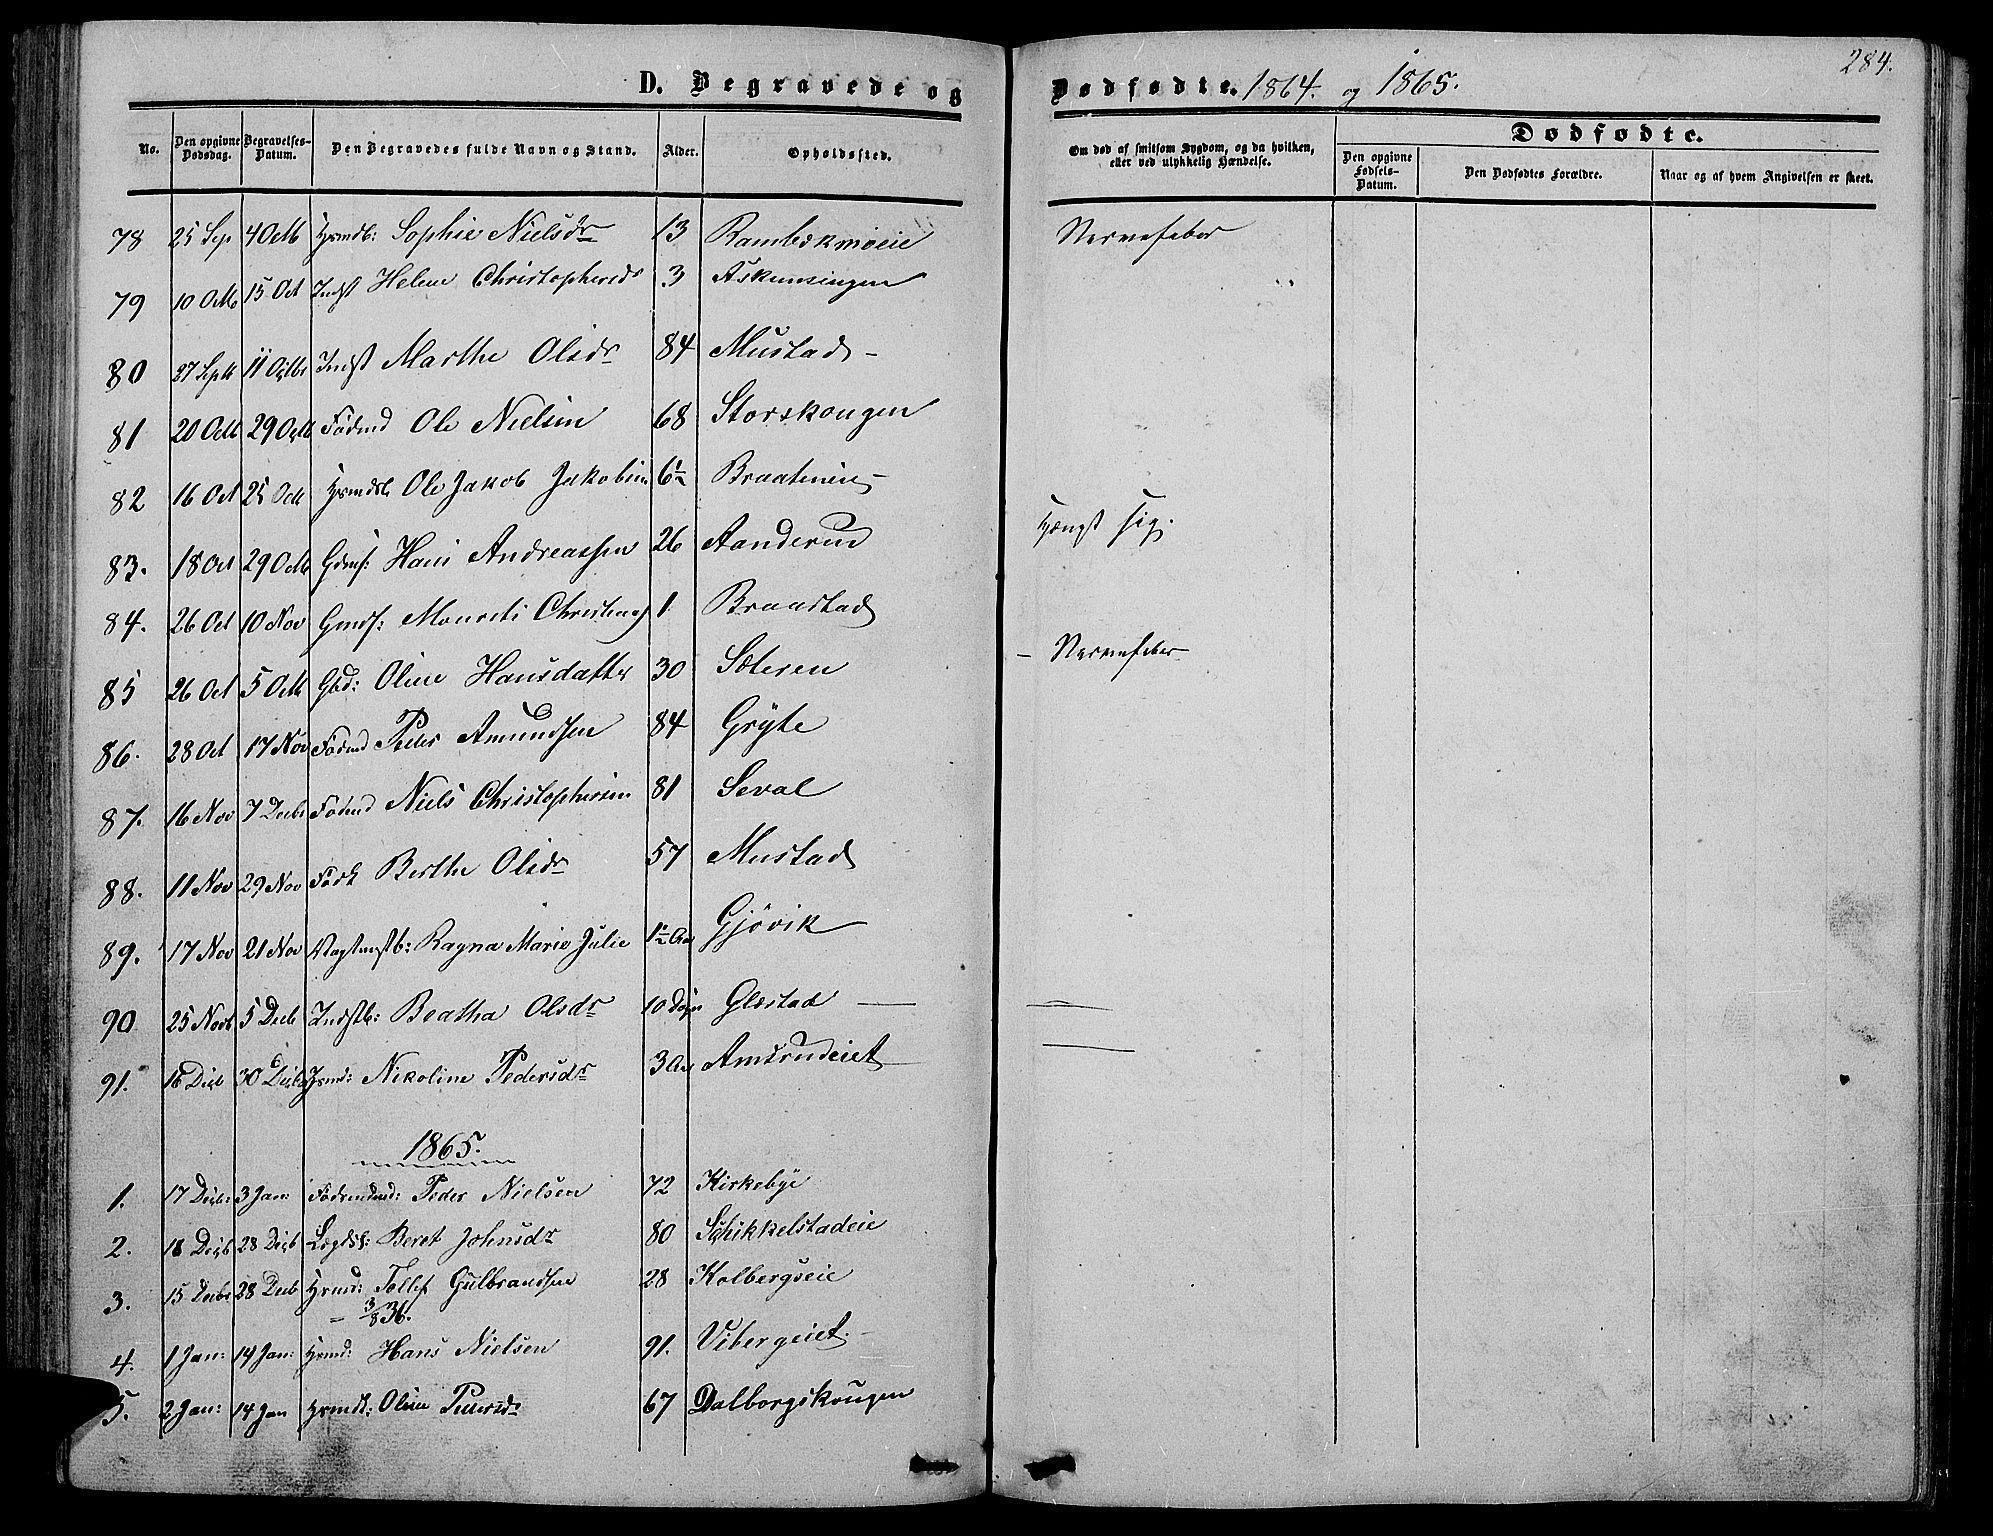 SAH, Vardal prestekontor, H/Ha/Hab/L0005: Klokkerbok nr. 5, 1854-1868, s. 284